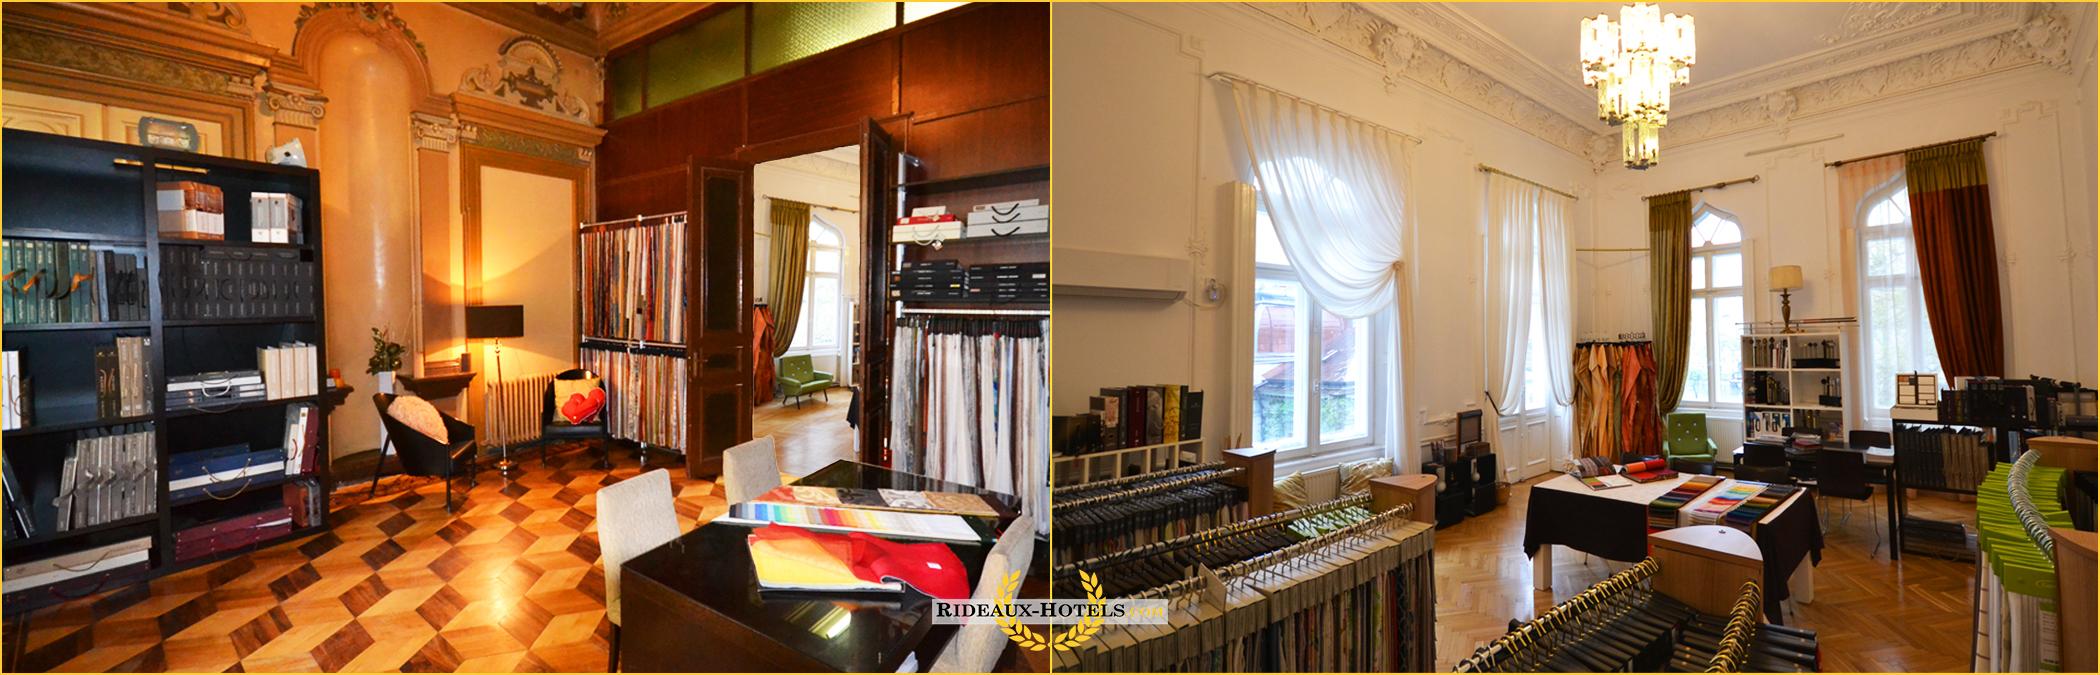 Rideaux Hotels Professionnels Showroom